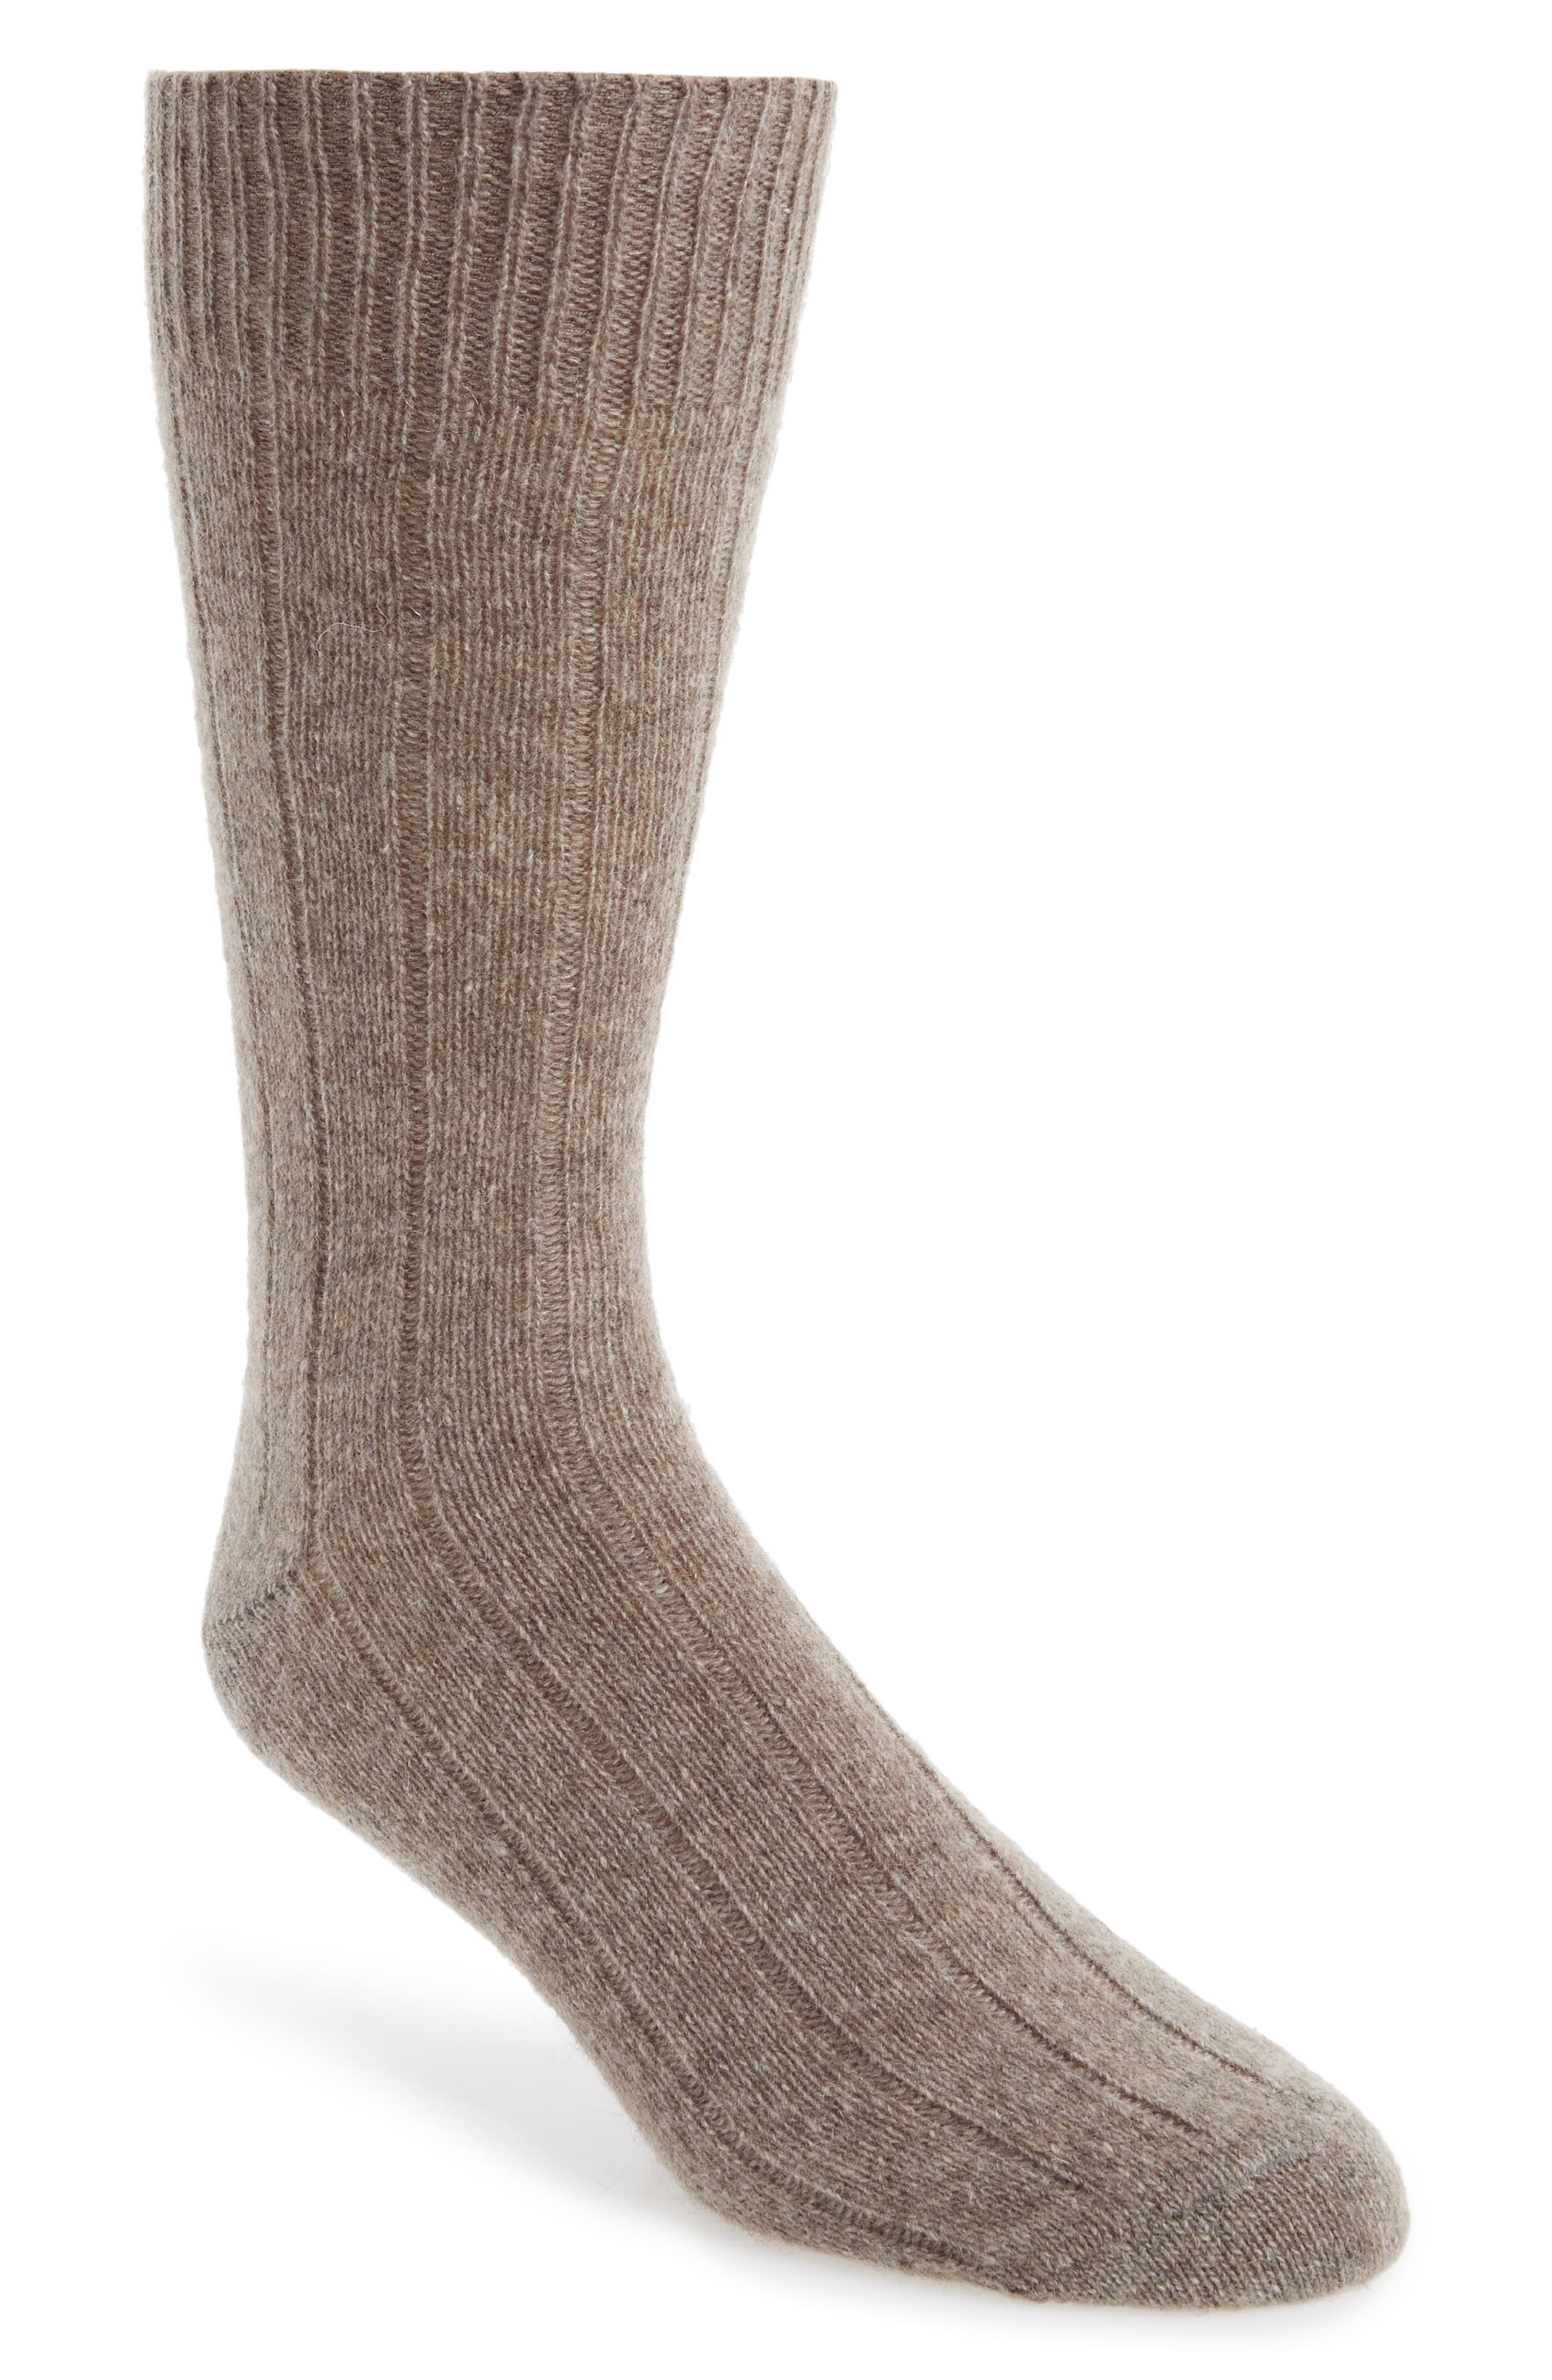 Cashmere Blend Socks,                             Main thumbnail 1, color,                             Oatmeal Heather